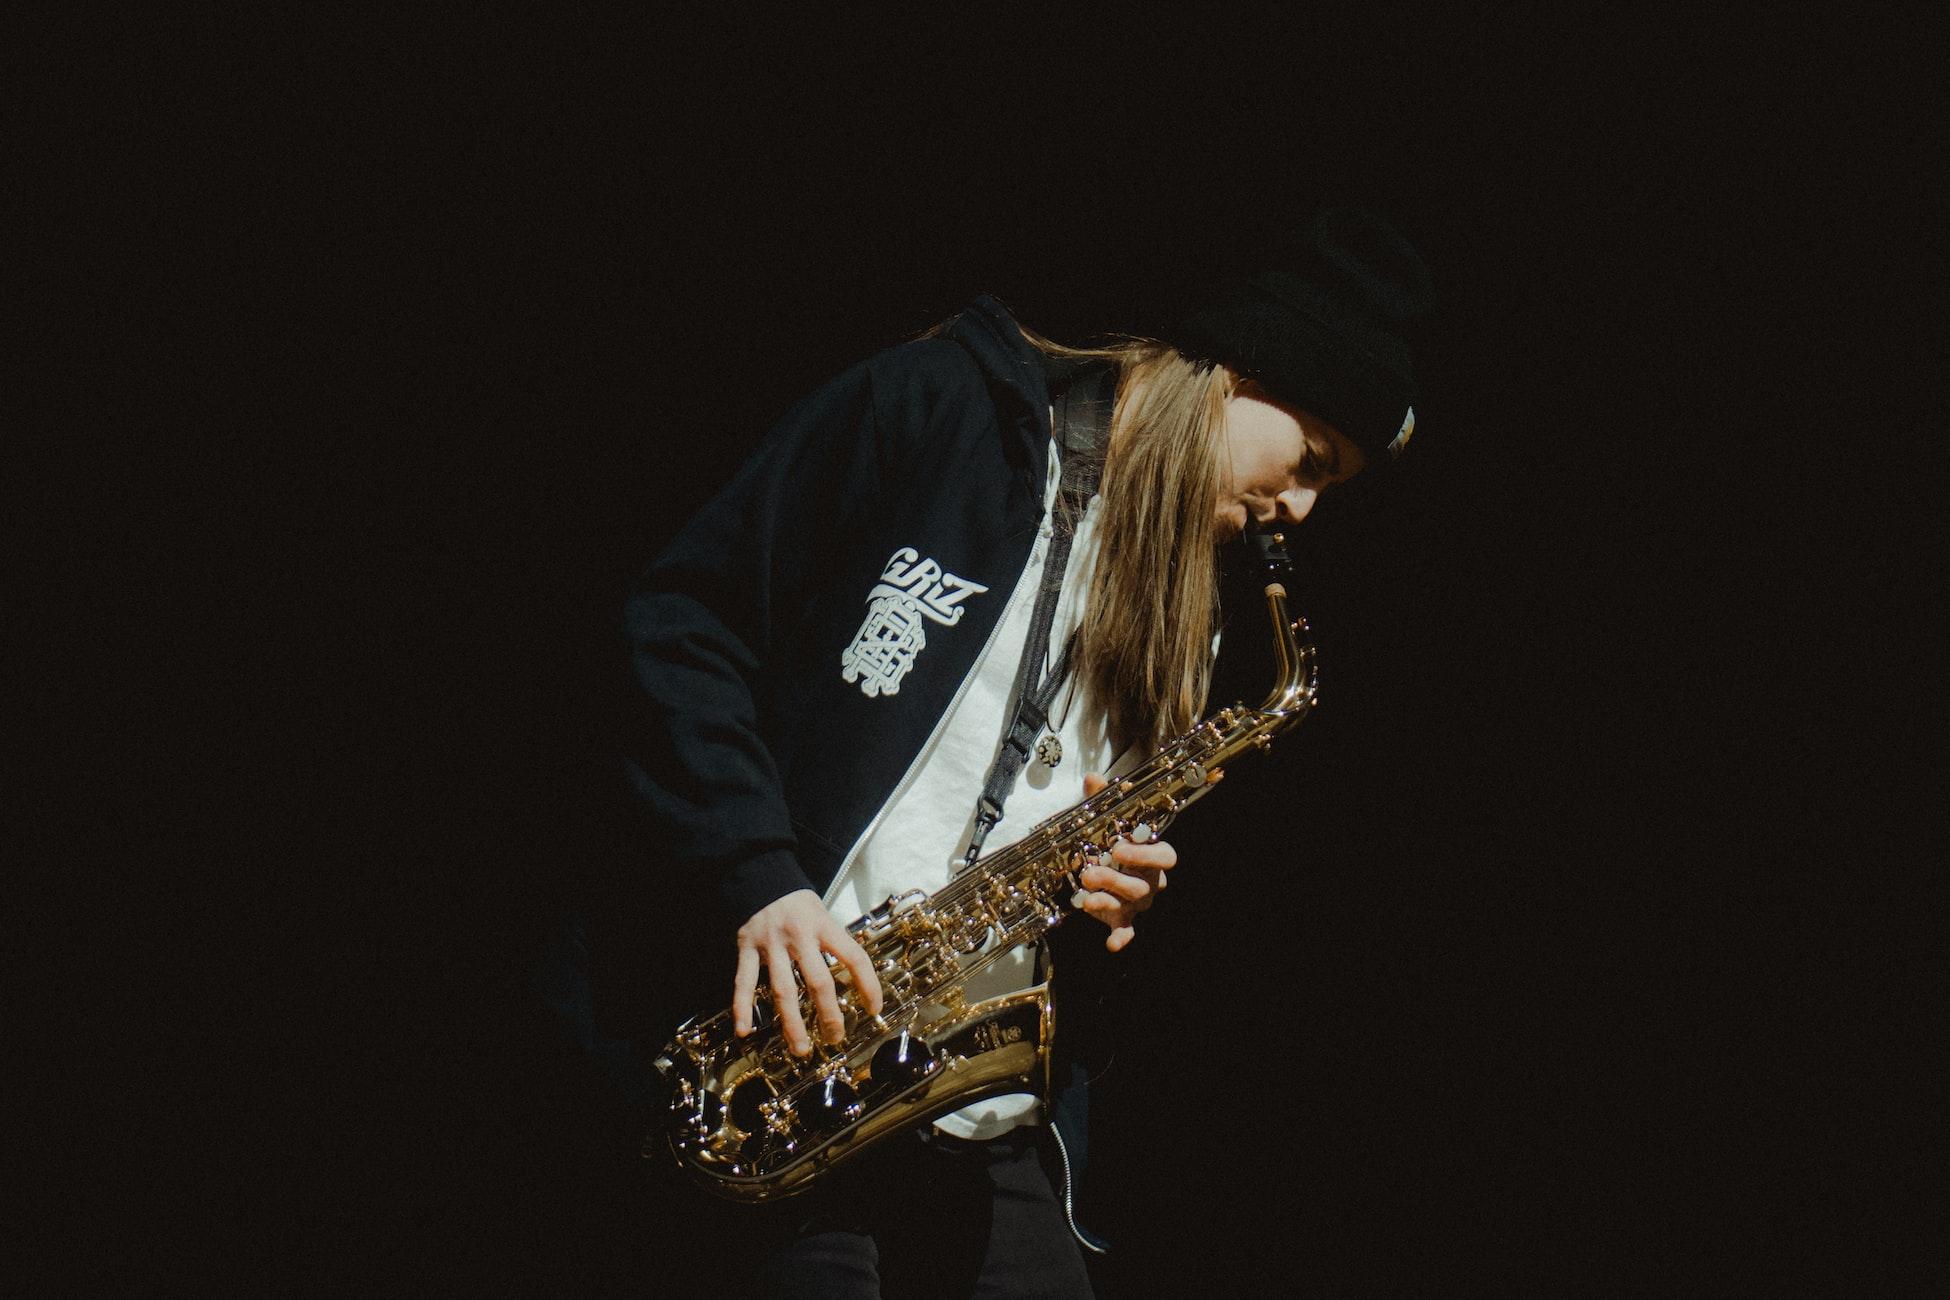 EDM artist Grant Kwiecinski (a.k.a GRiZ) playing his saxophone.